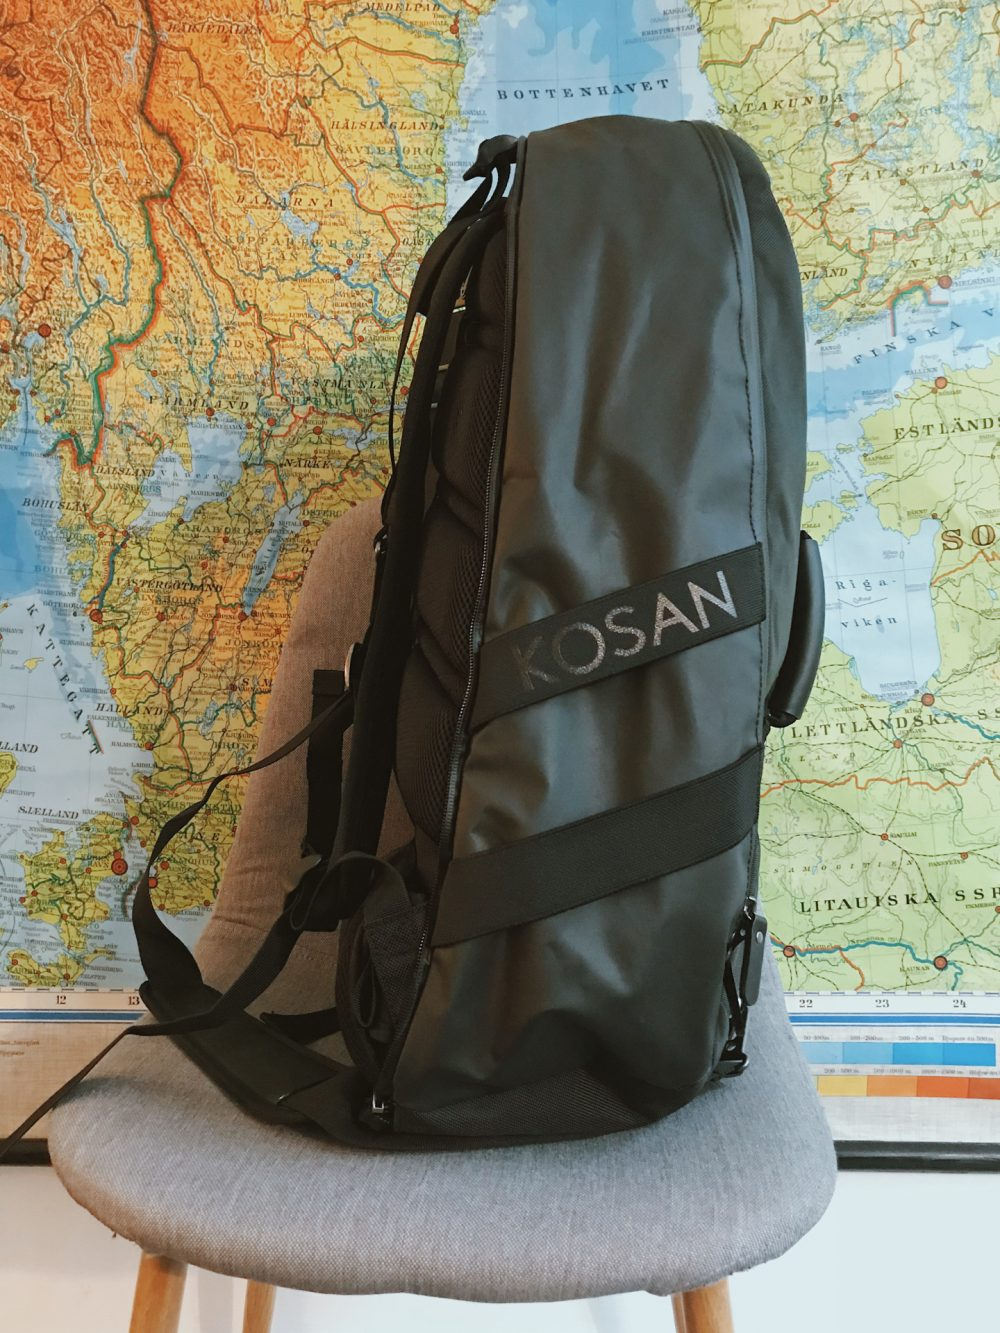 A black hiking bag on a chair